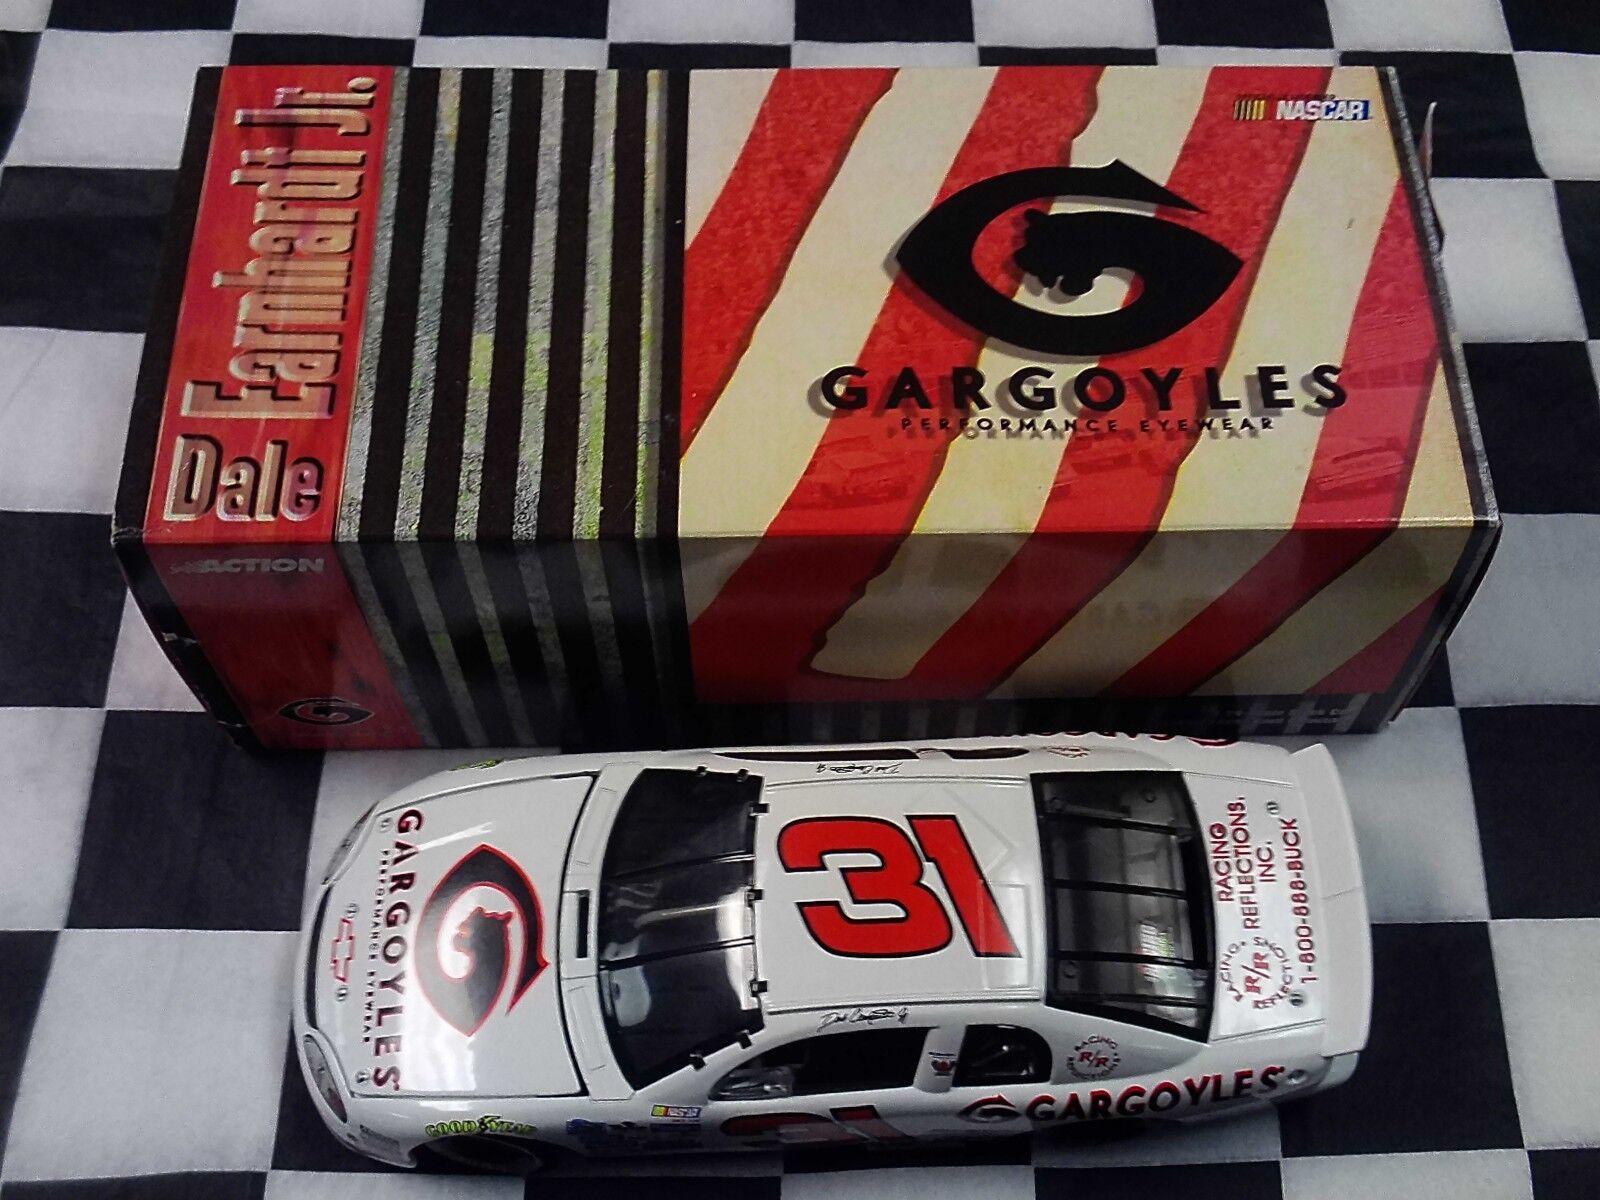 Dale Earnhardt Jr  31 Gargoyles 1997 Monte Carlo 1:24 Action NIB 1 of 7,500 BANK